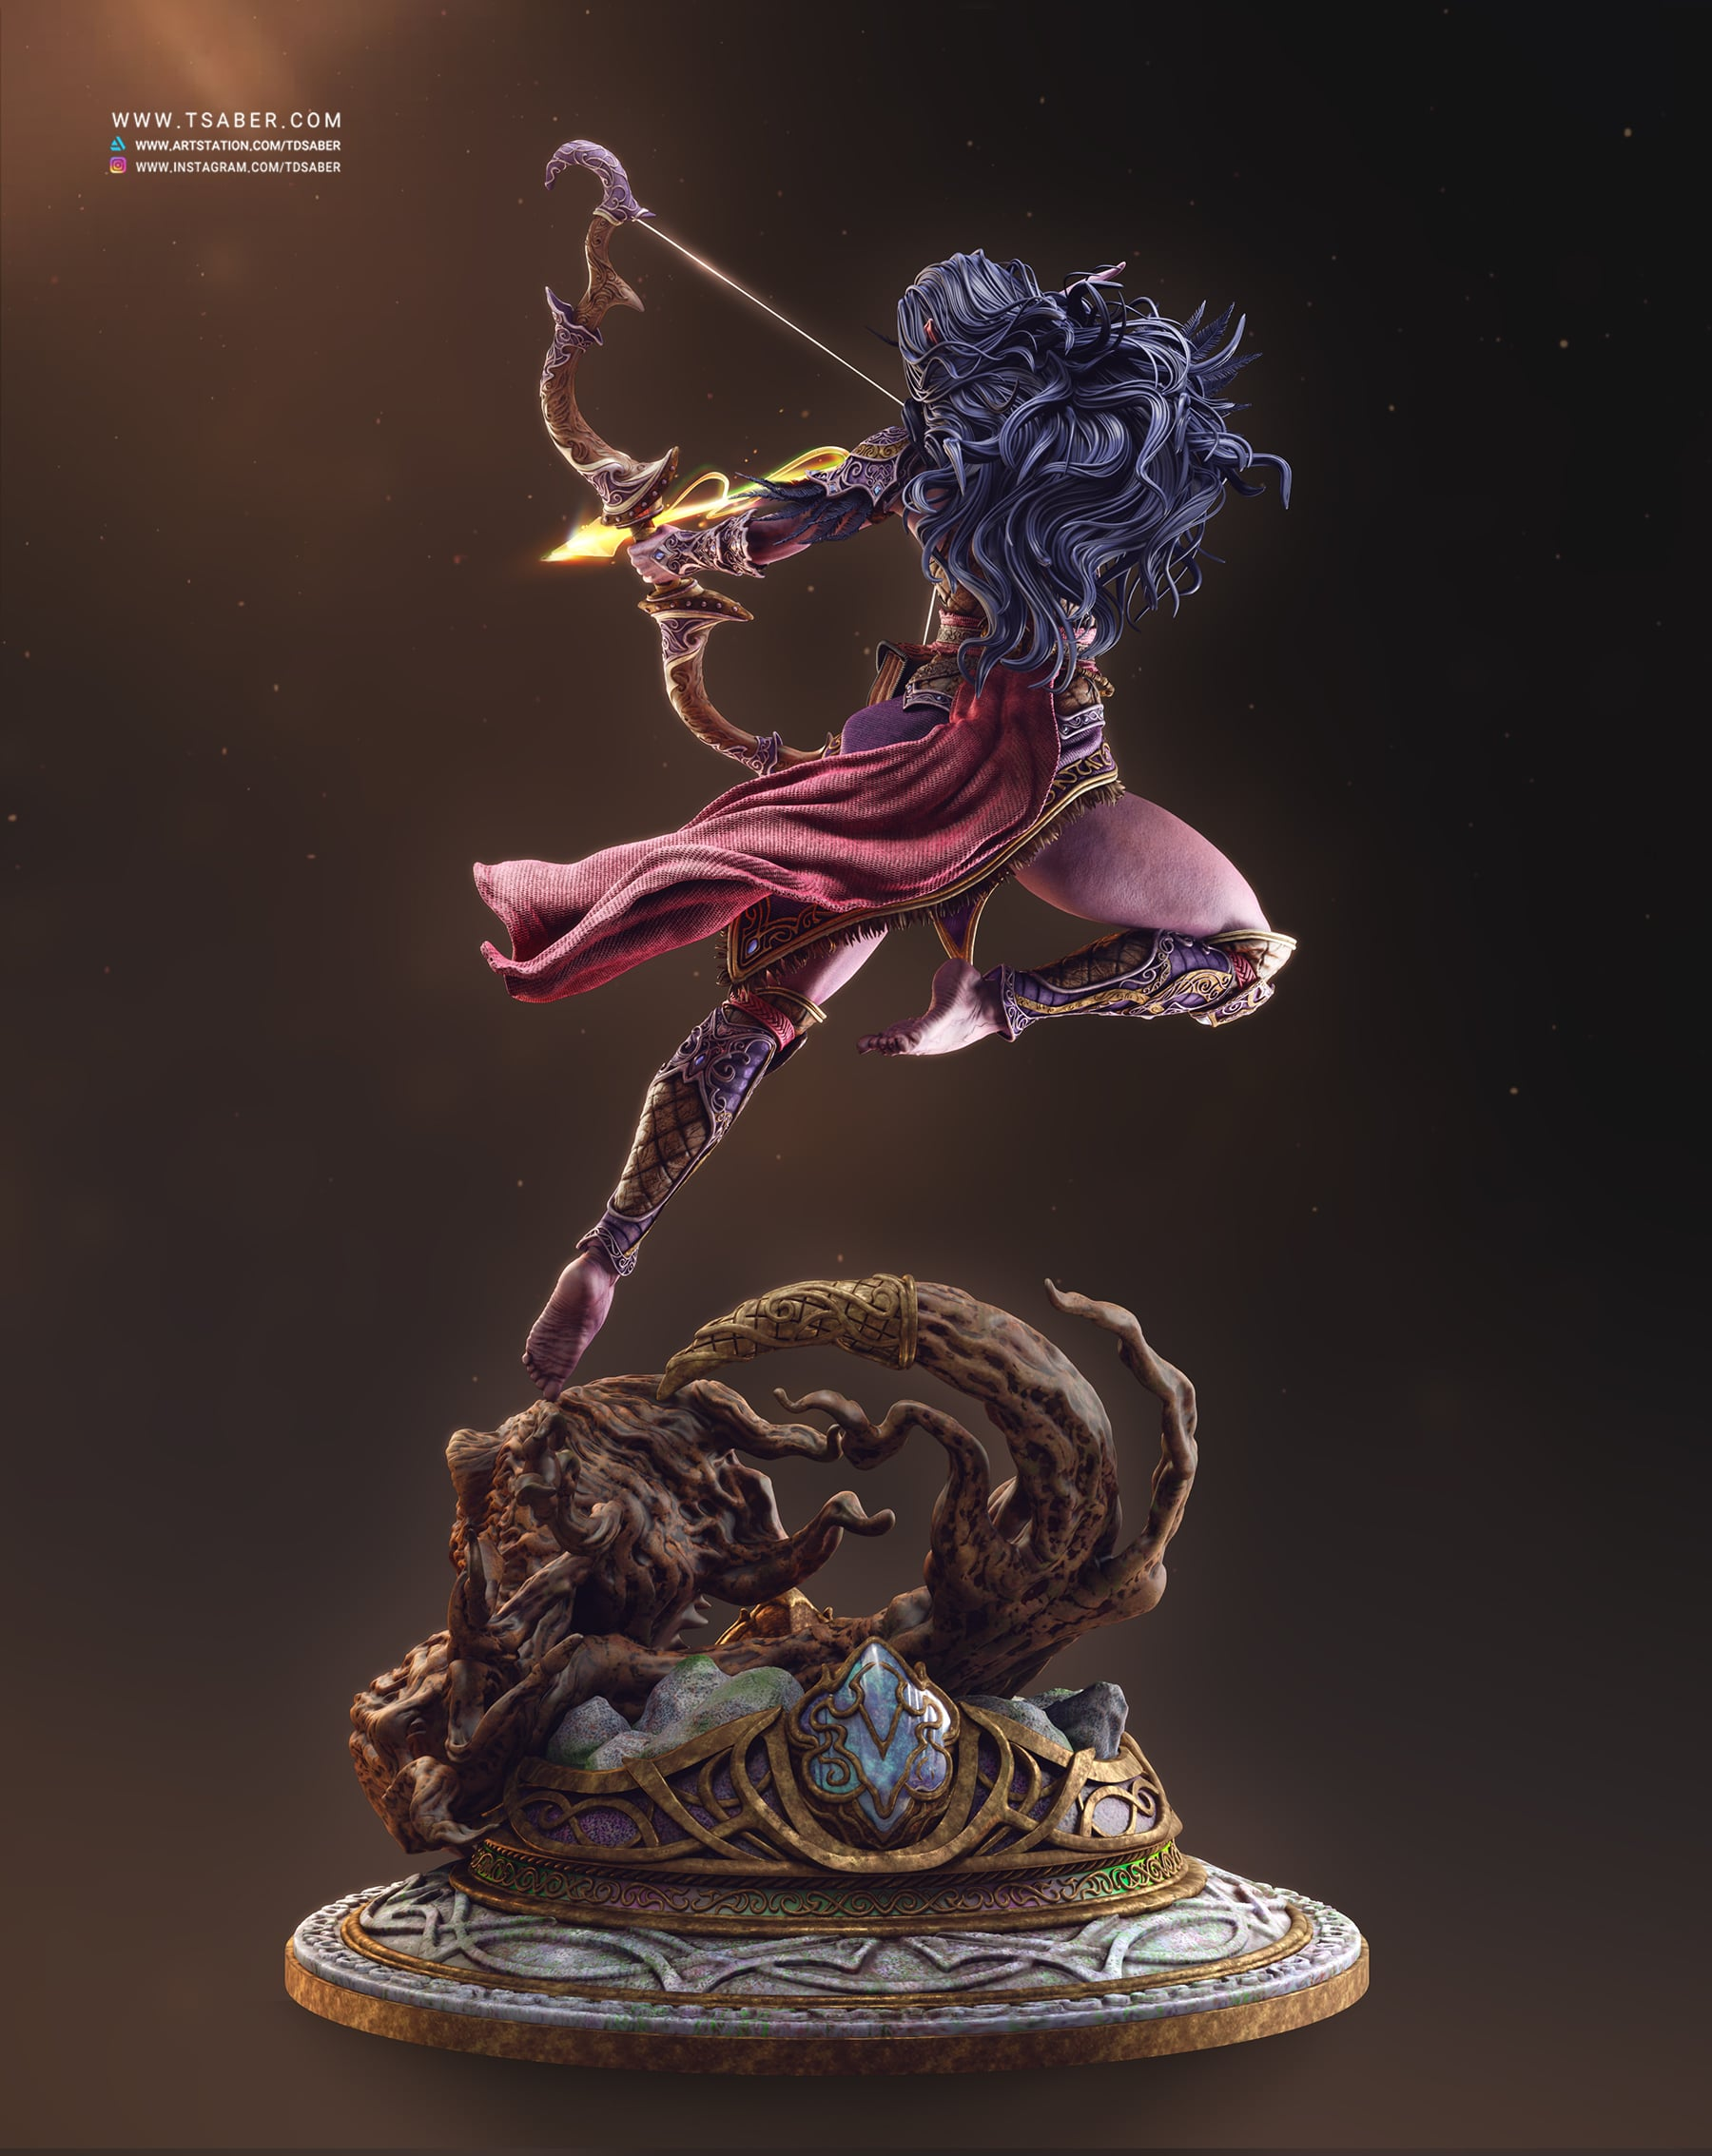 Night Elf Statue - Warcraft Collectibles - Tsaber